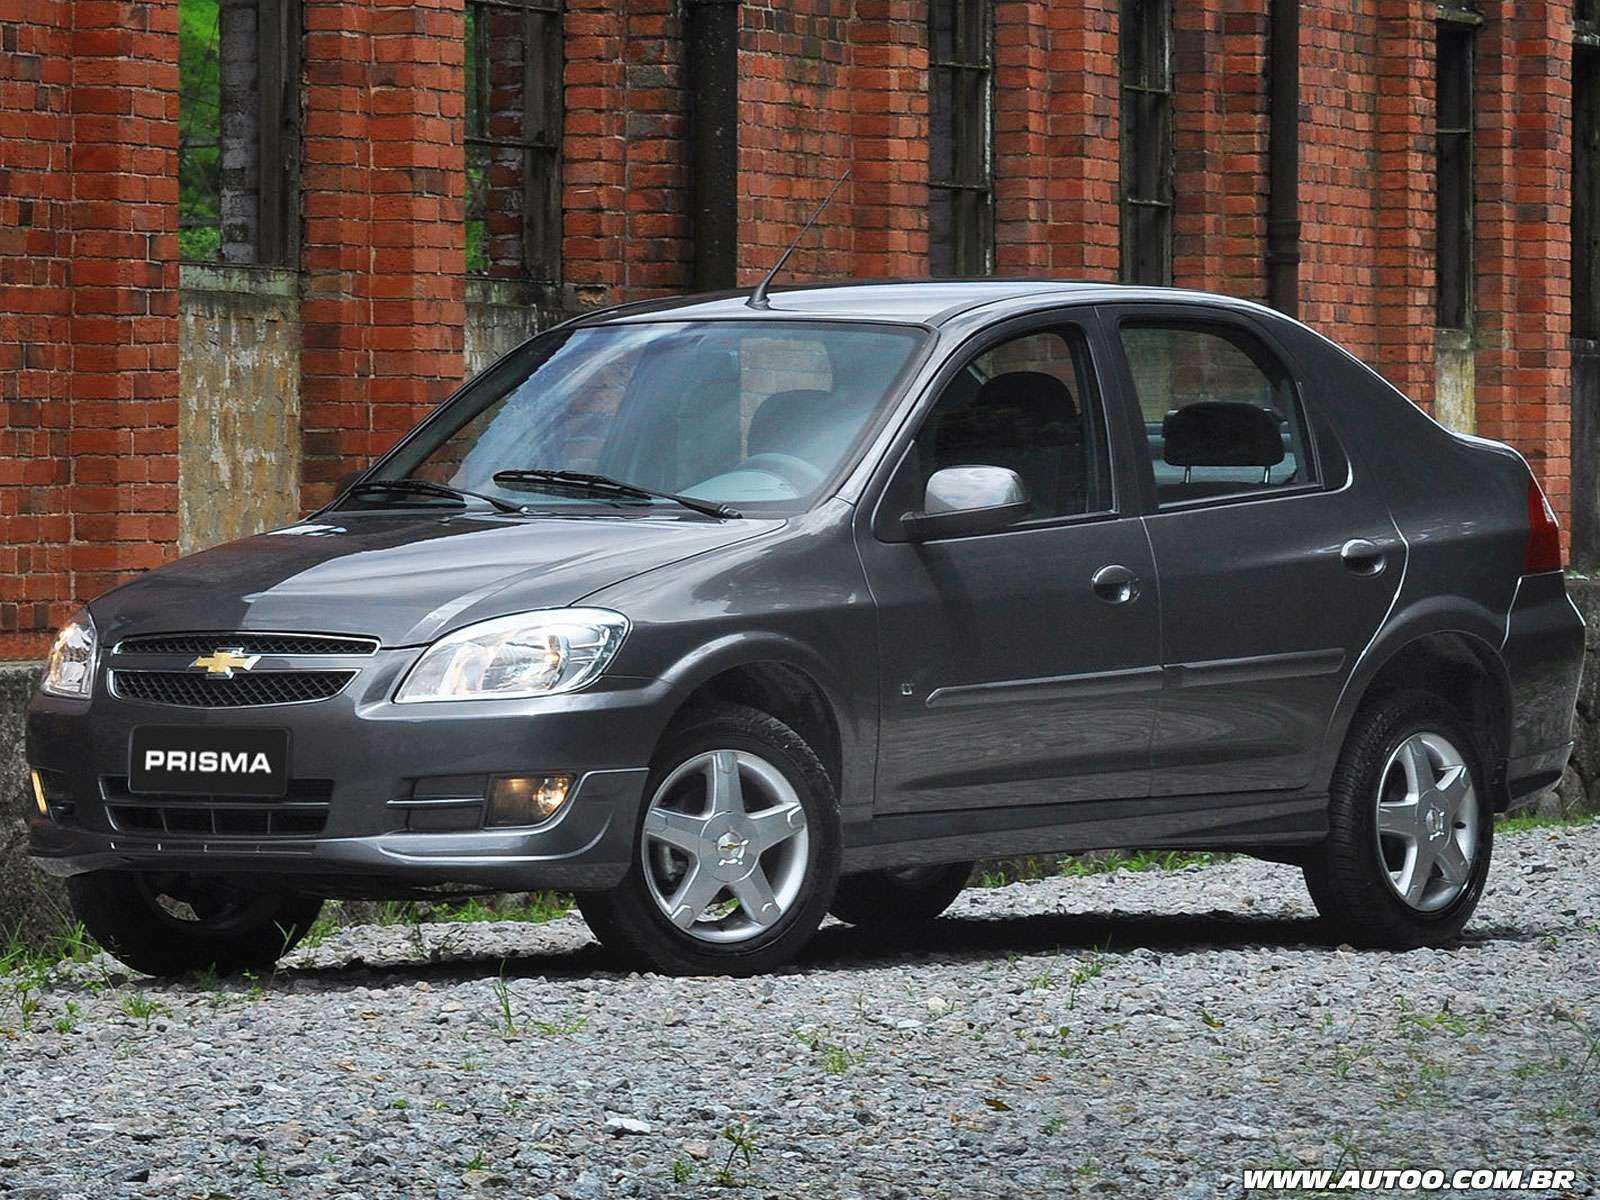 ChevroletPrisma 2012 - ângulo frontal